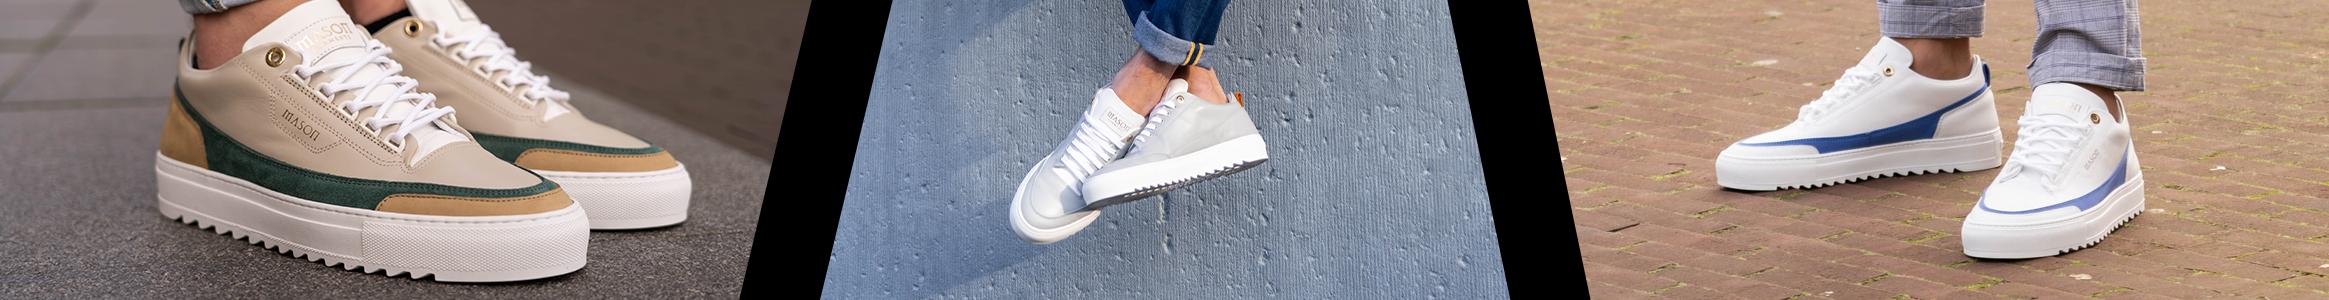 mason-garments schoenen